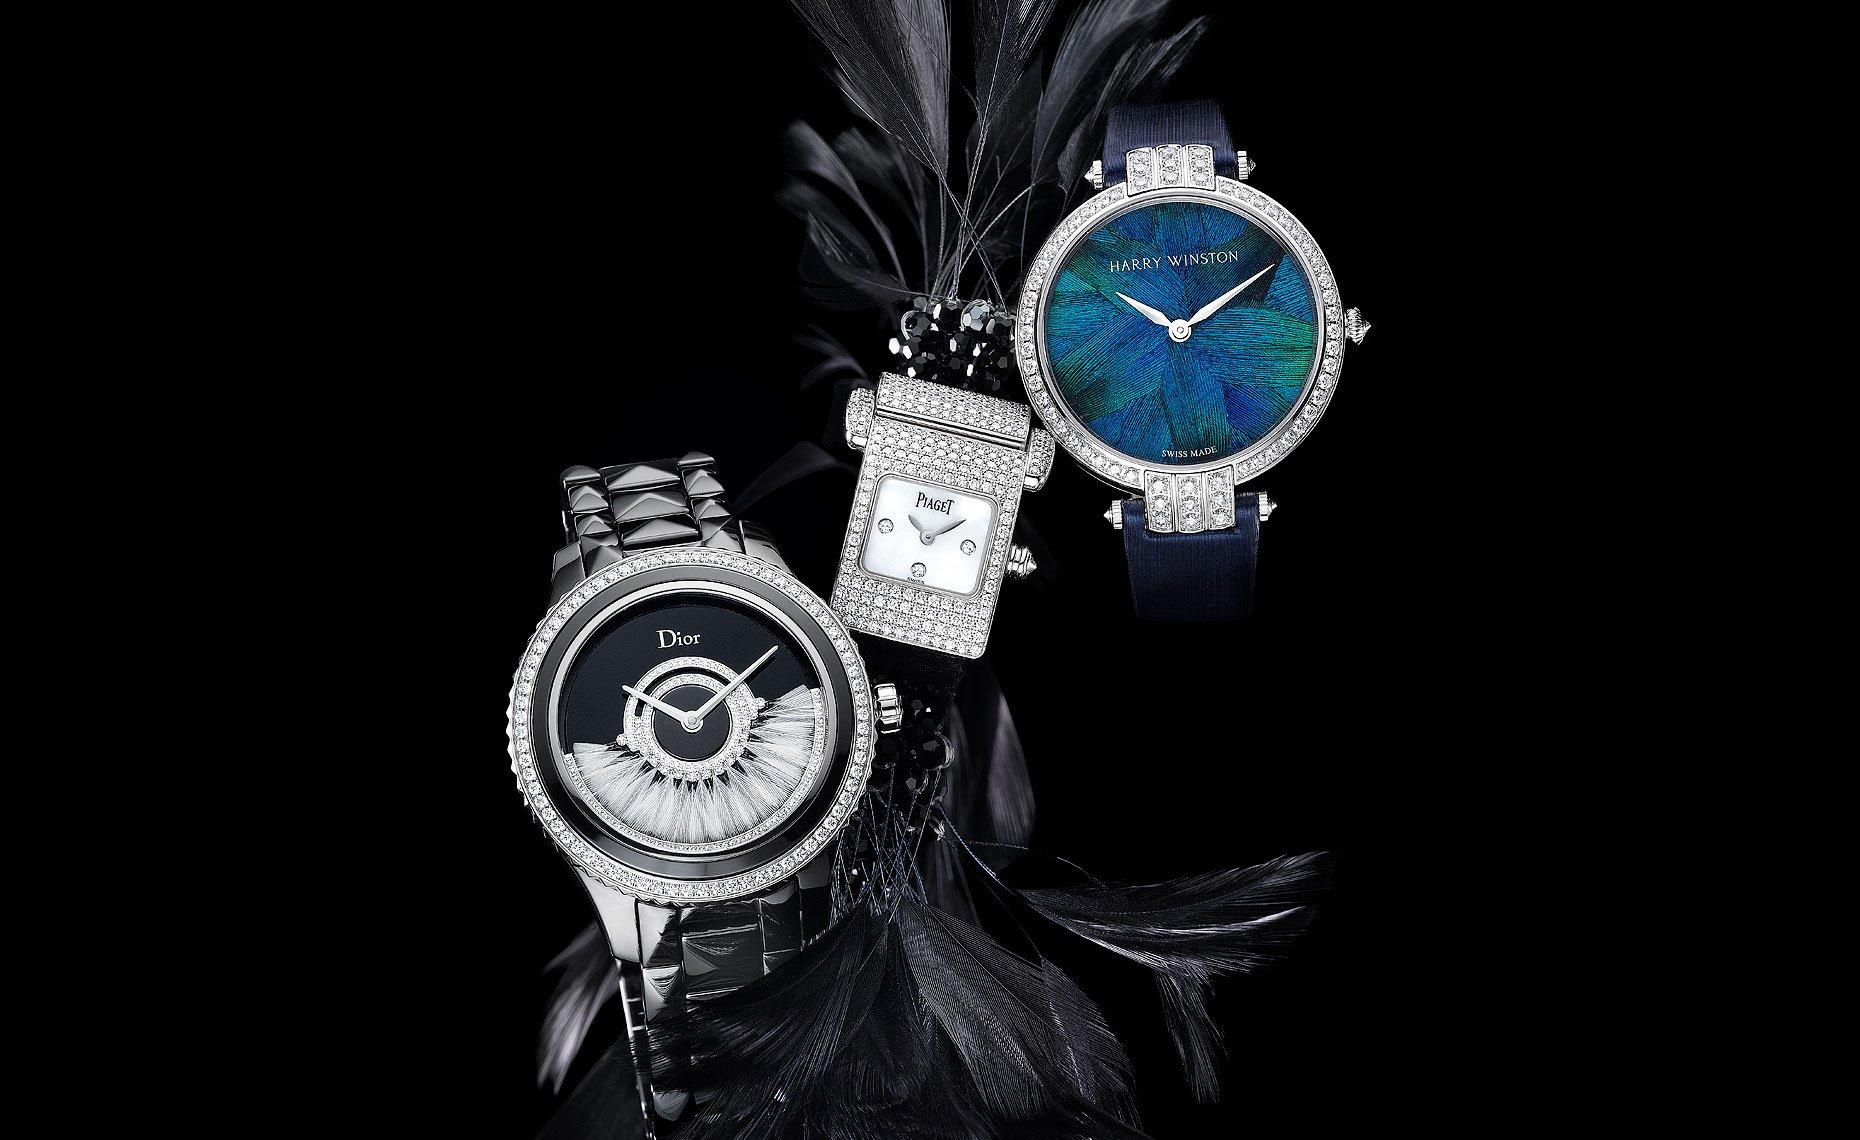 Mens Diamond Watches Designs -o- | Wallpaper Picture Photo